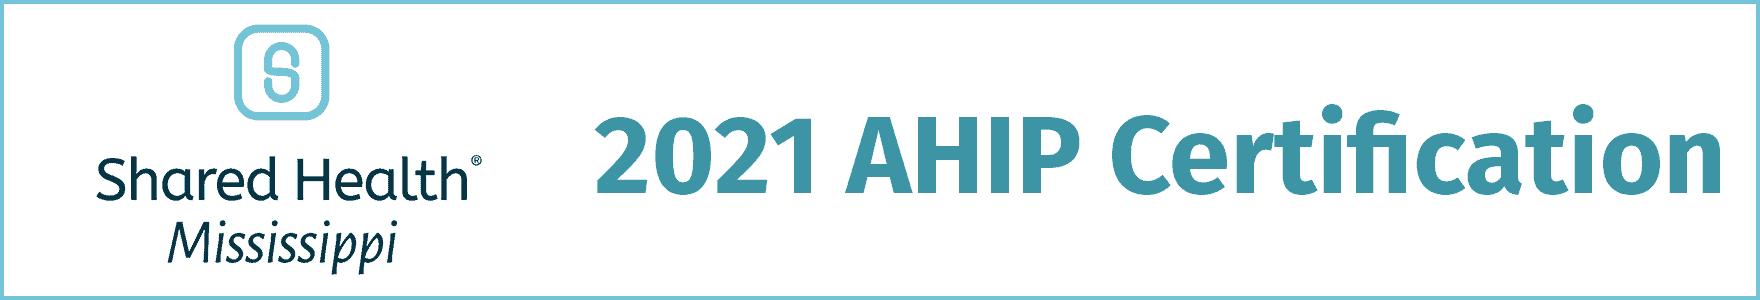 Shared Health of MS AHIP 2021